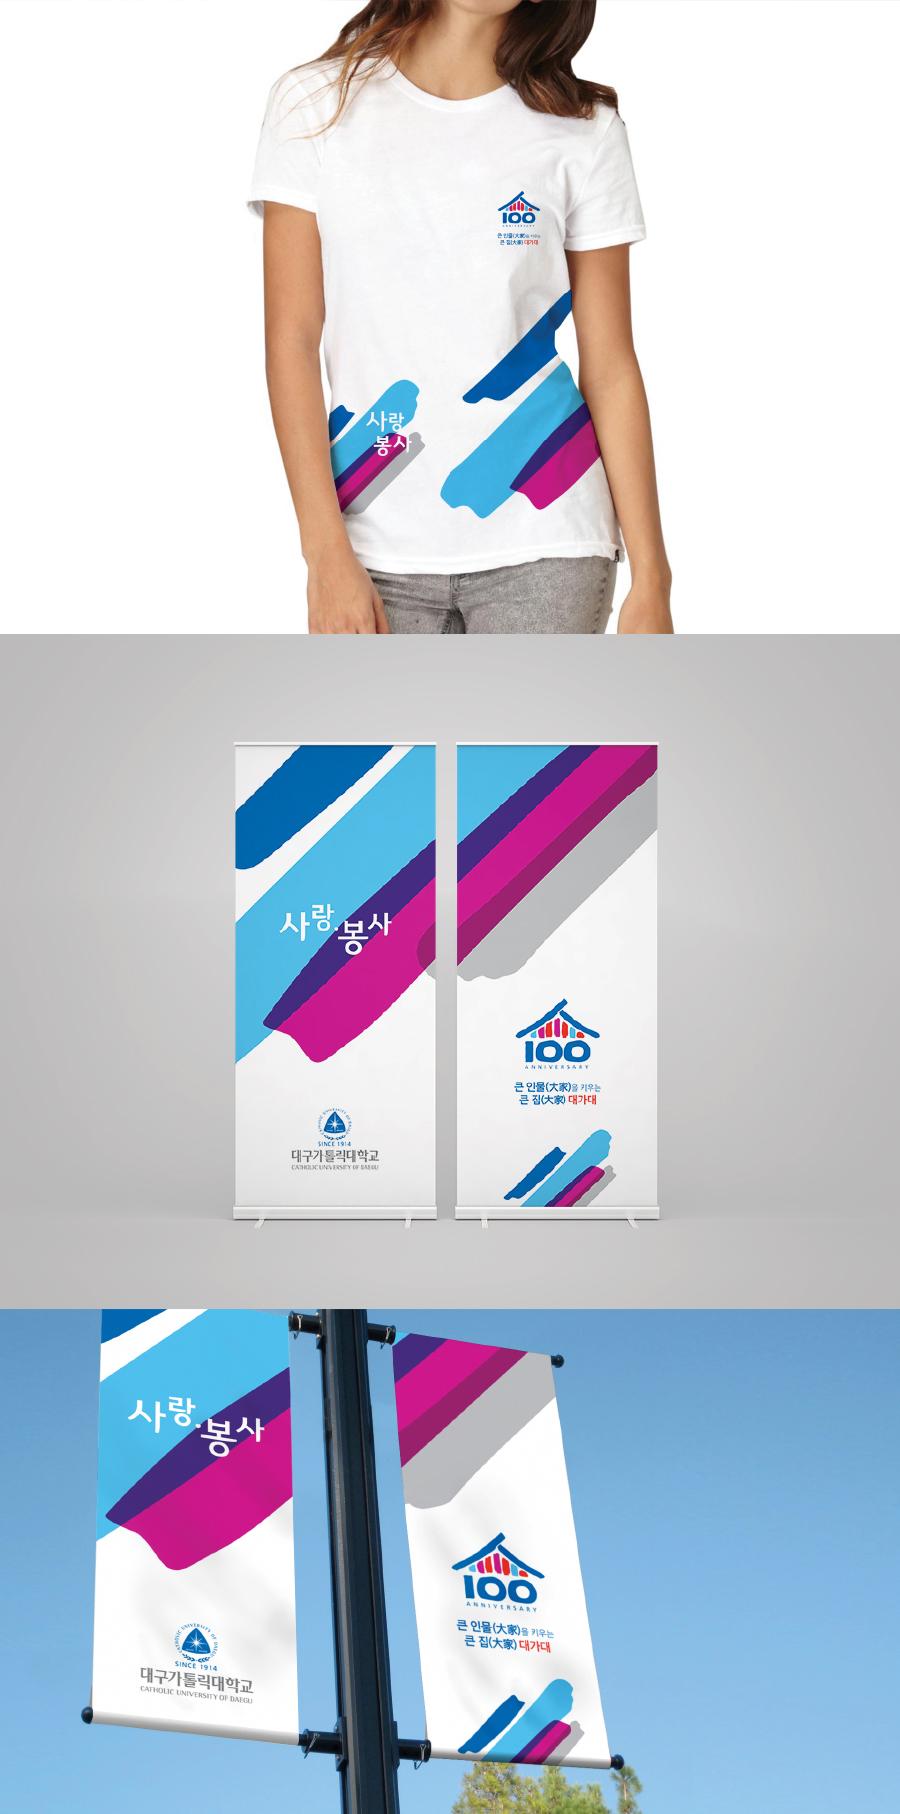 CUD100-si-total-900_03